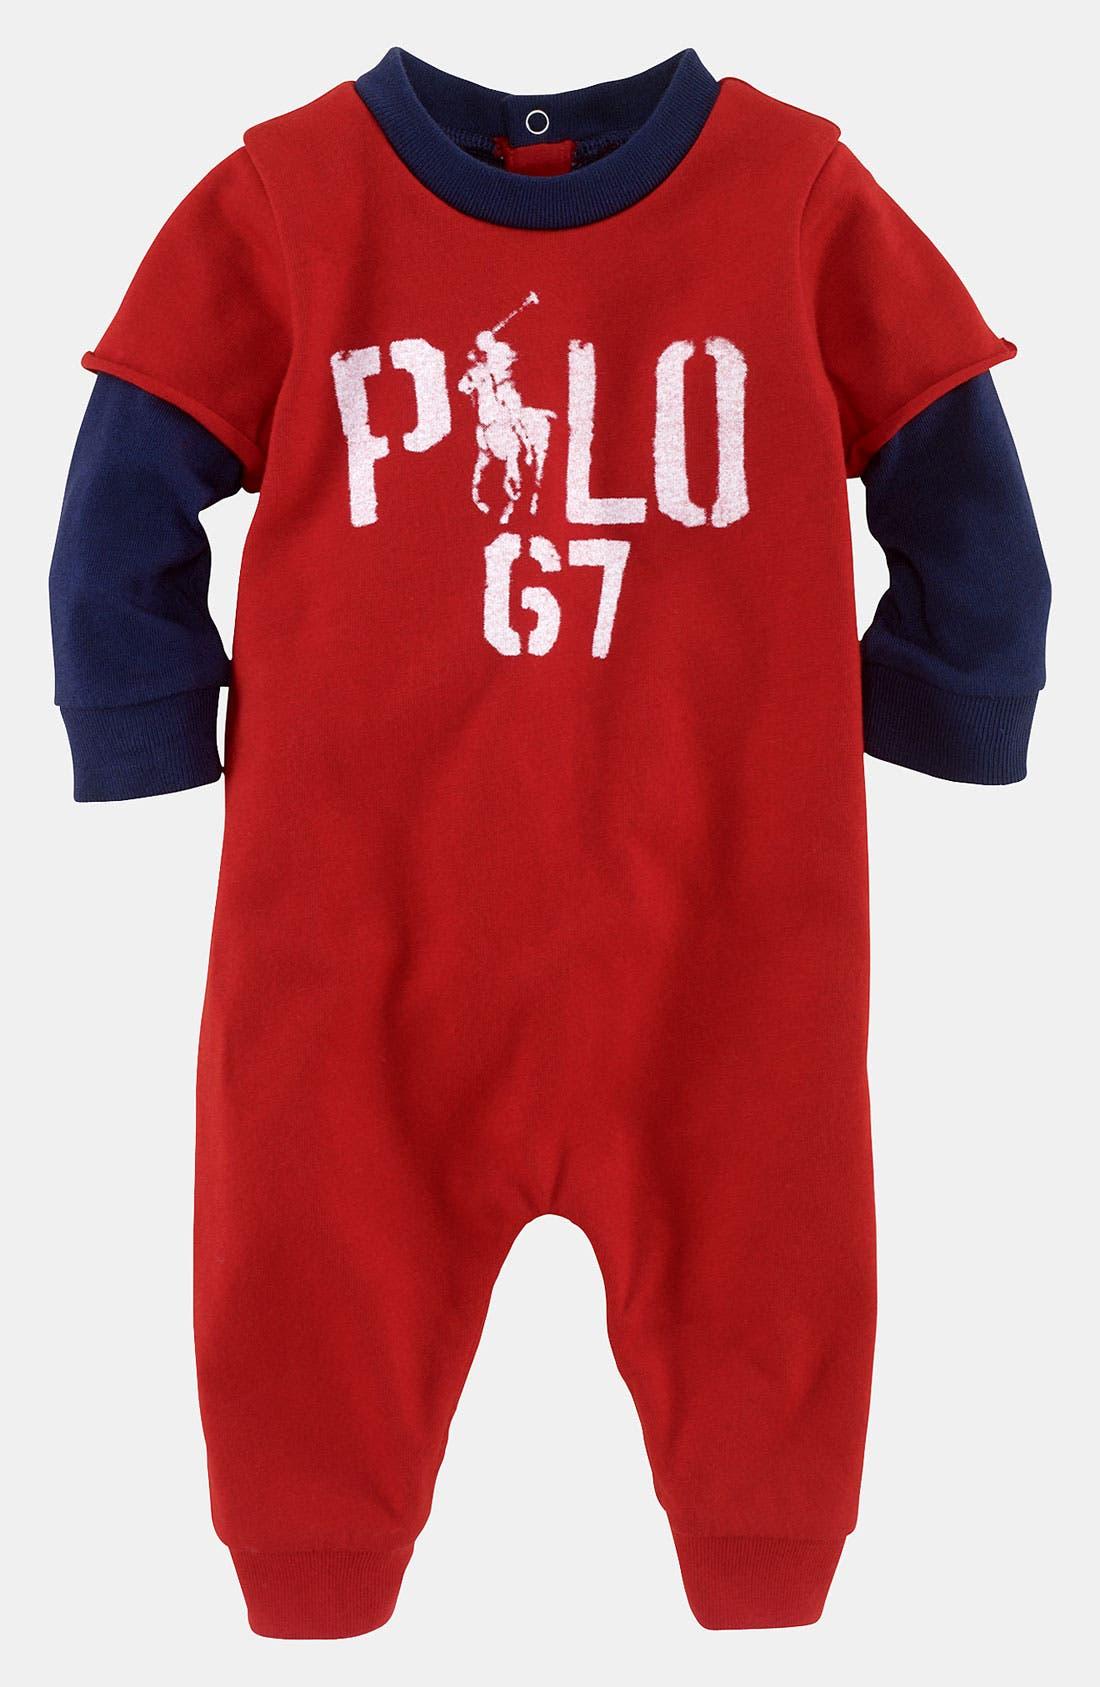 Alternate Image 1 Selected - Ralph Lauren Layered Sleeve Romper (Infant)